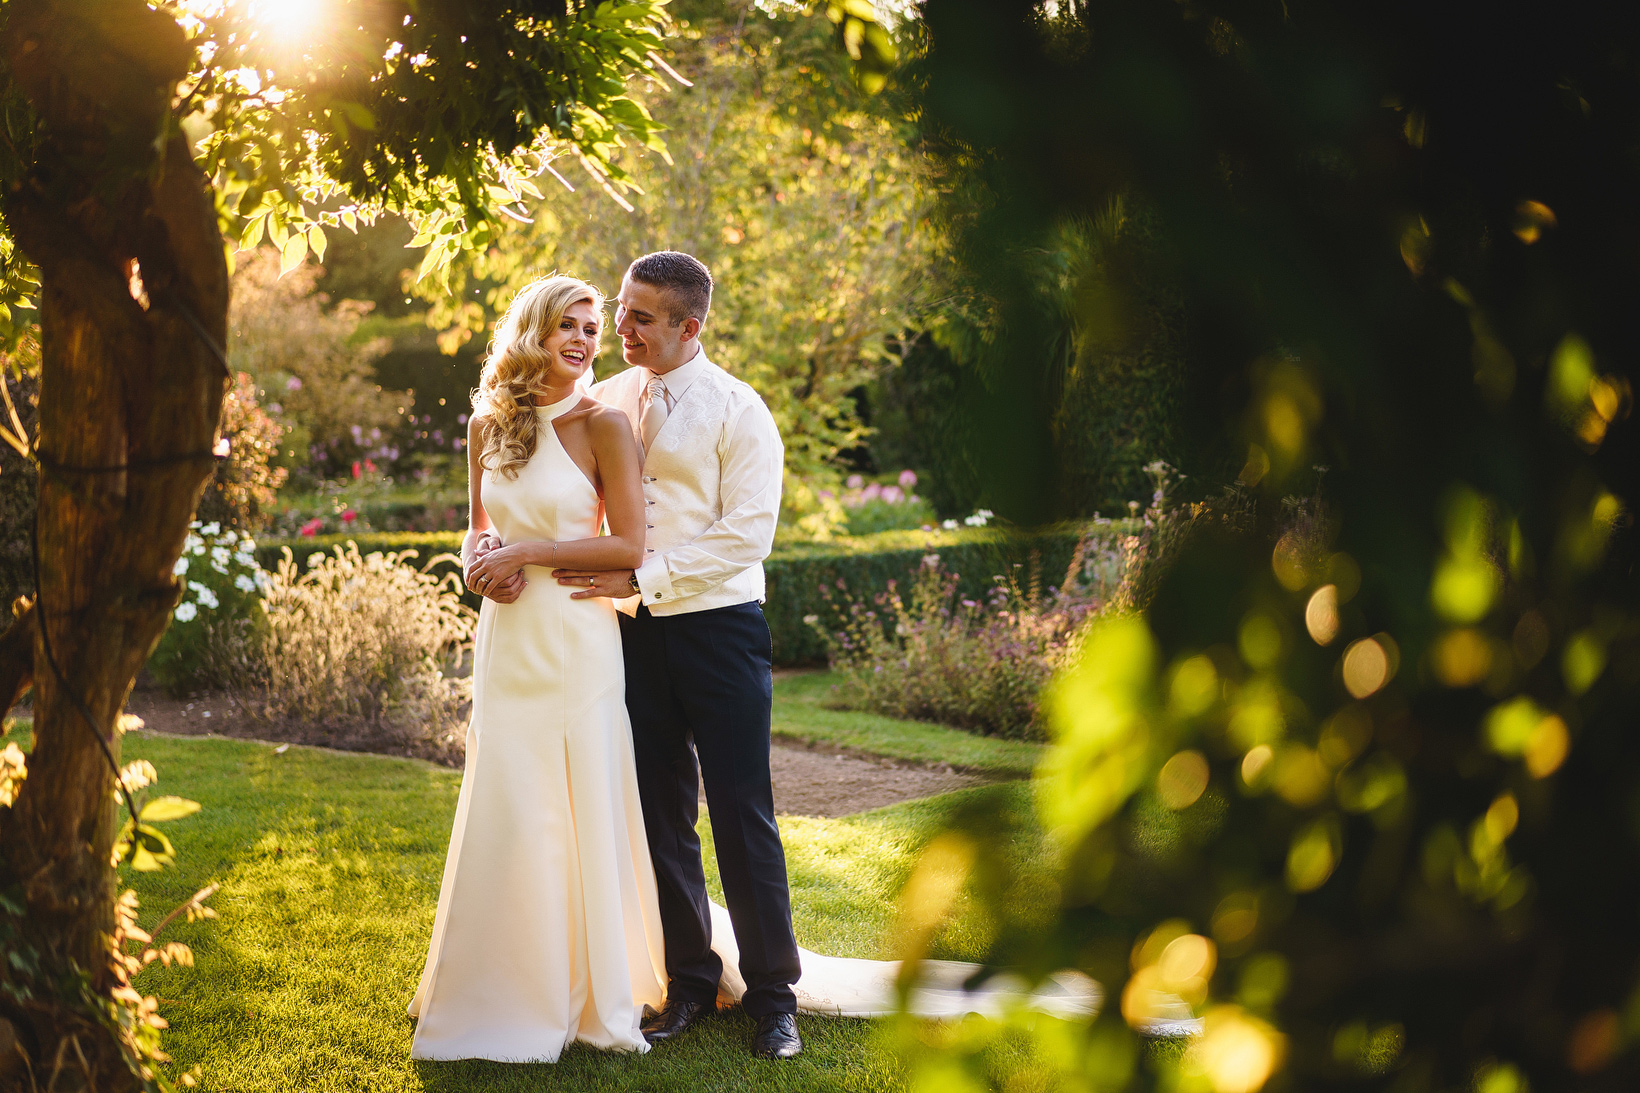 Yalding Gardens Wedding